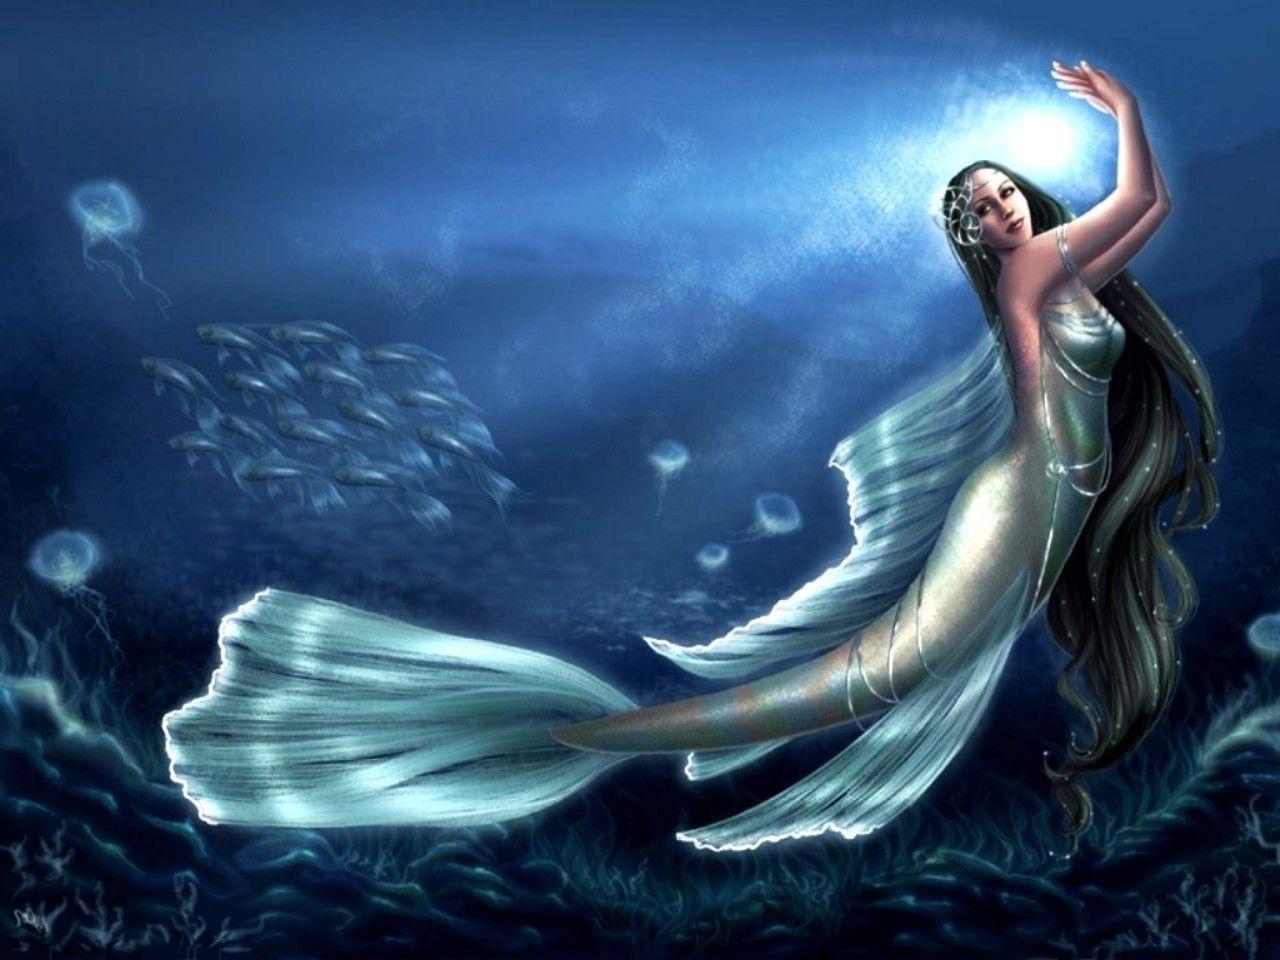 Fantasy Art Mermaids | mermaid fantasy mermaid wallpaper ...